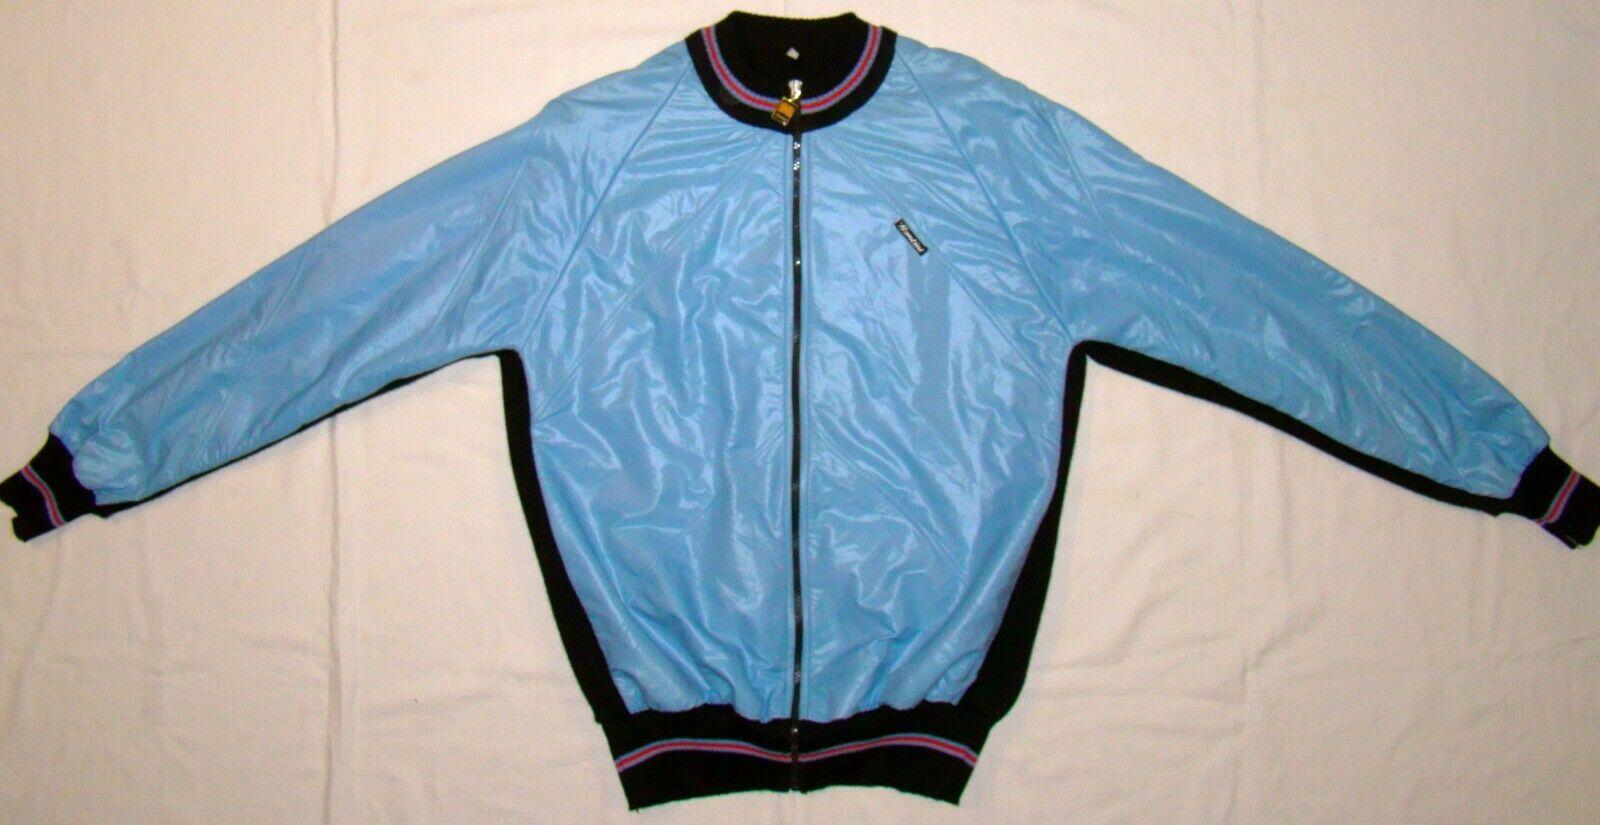 Vintage NOS Santini Heavyweight Wool Winter Road Cycling Jacket   L - XL as NEW